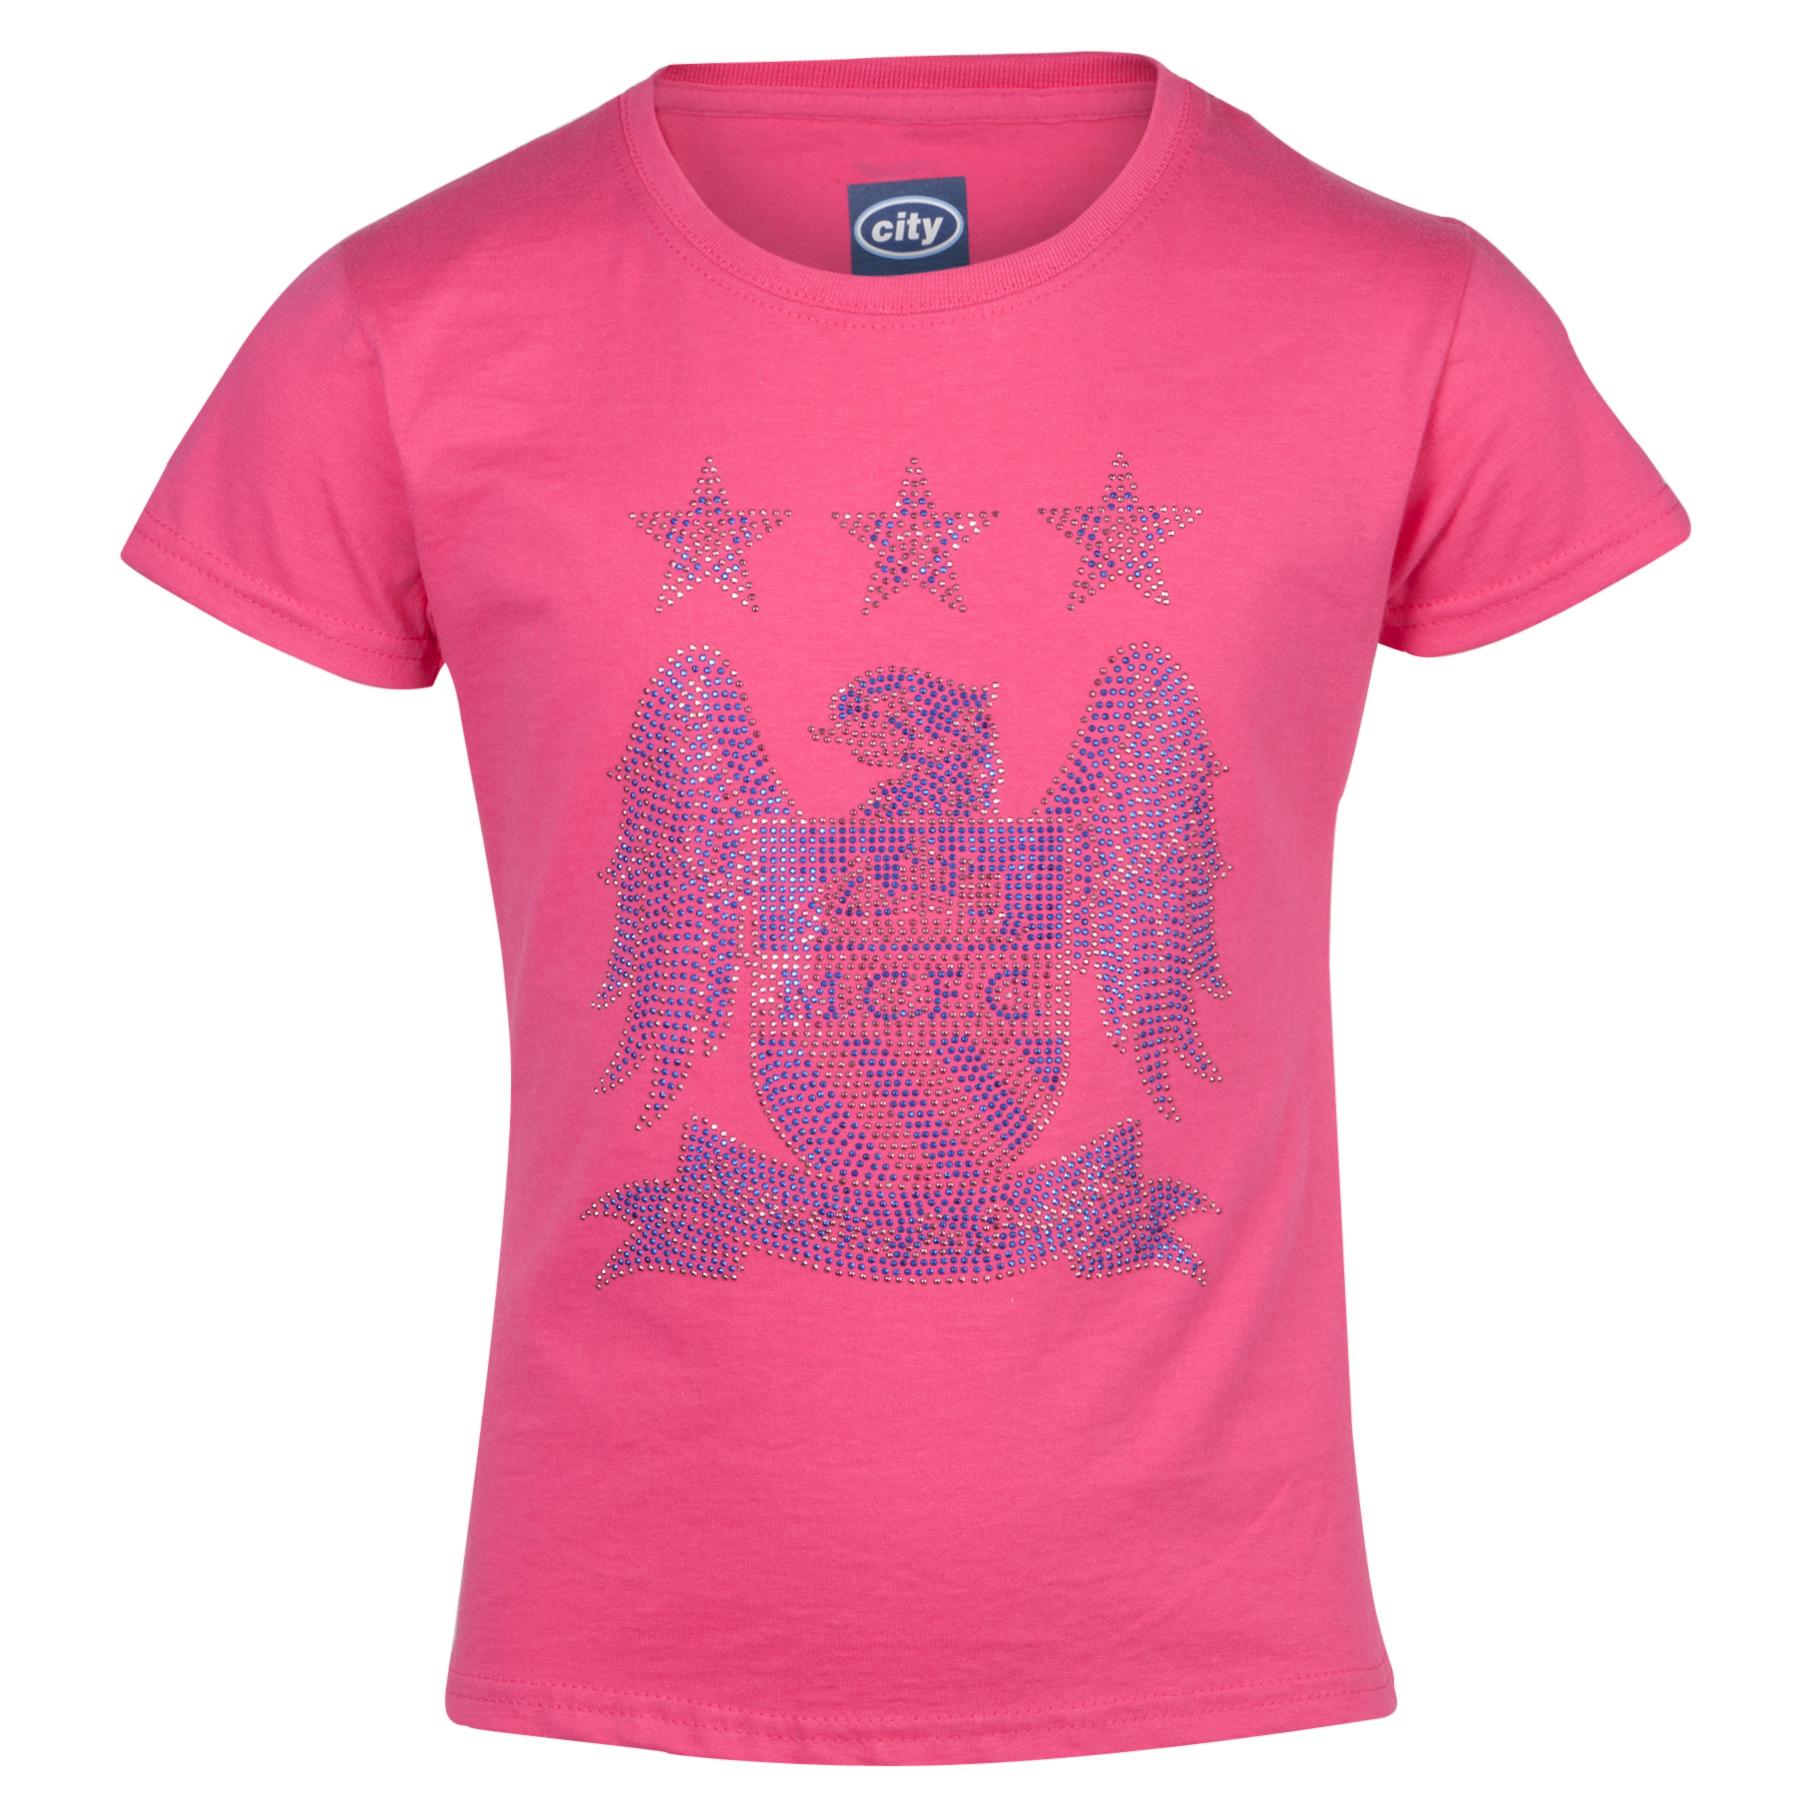 Manchester City Rhinestone TShirt -Girls Pink